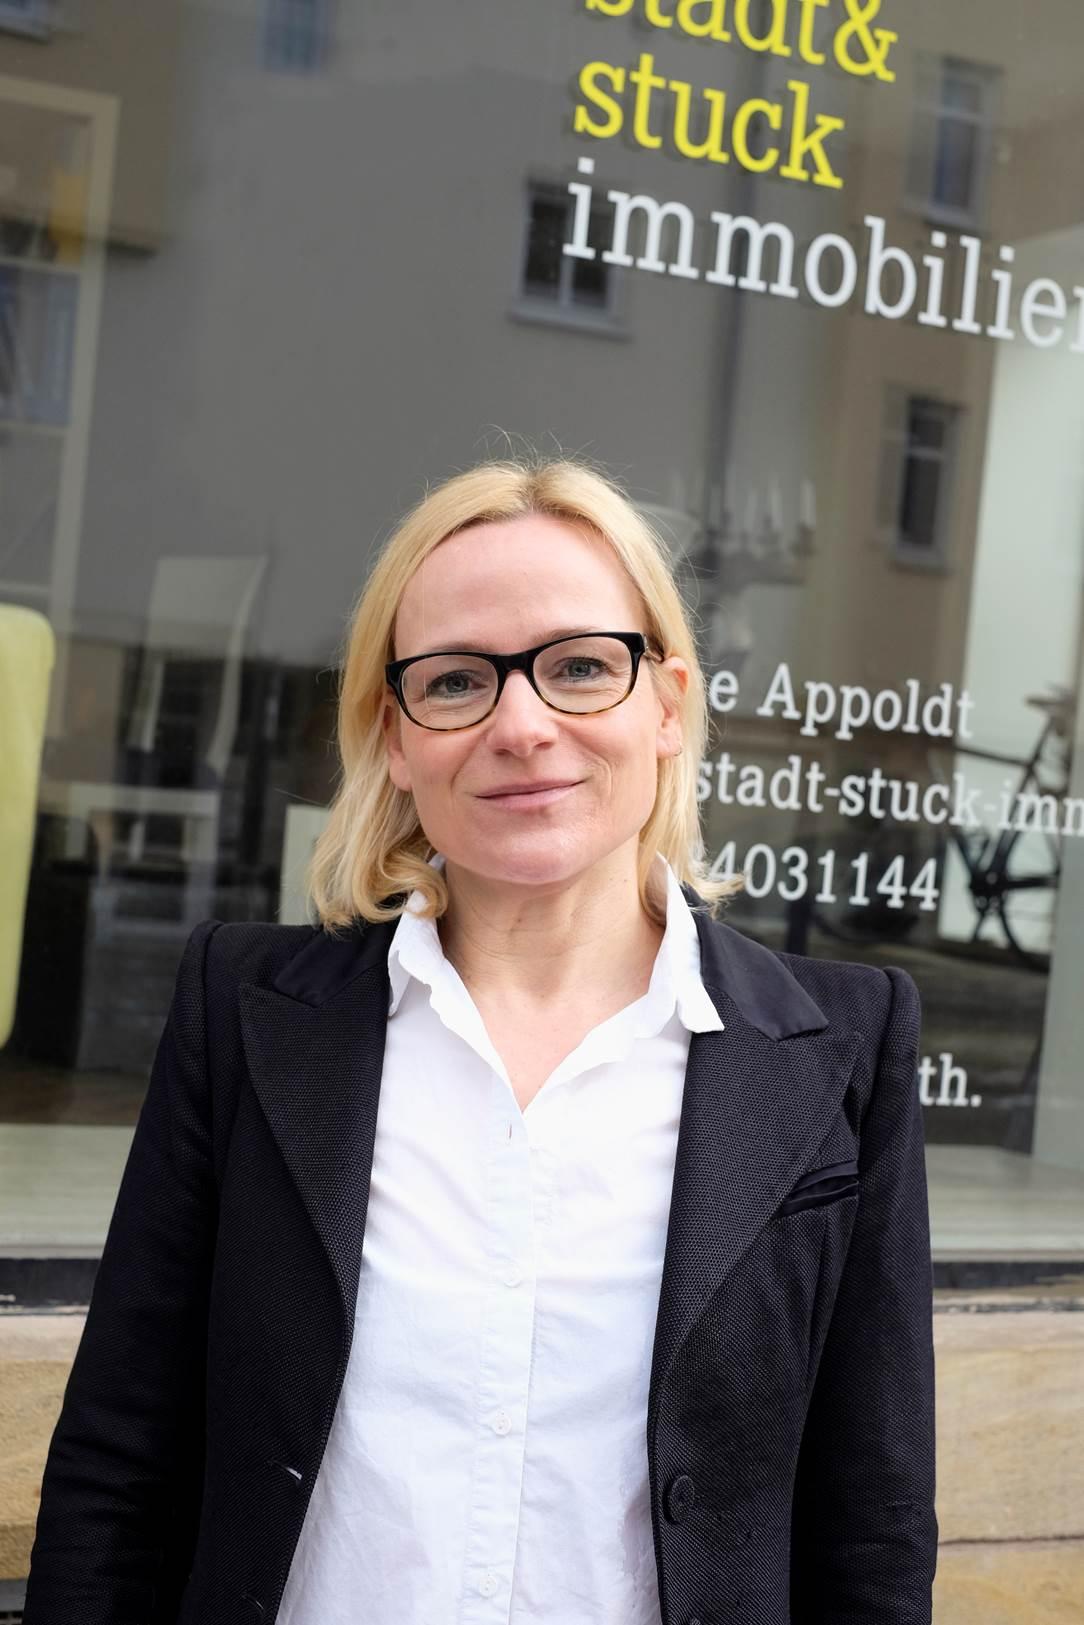 Stadt & Stuck Immobilien Simone Appoldt